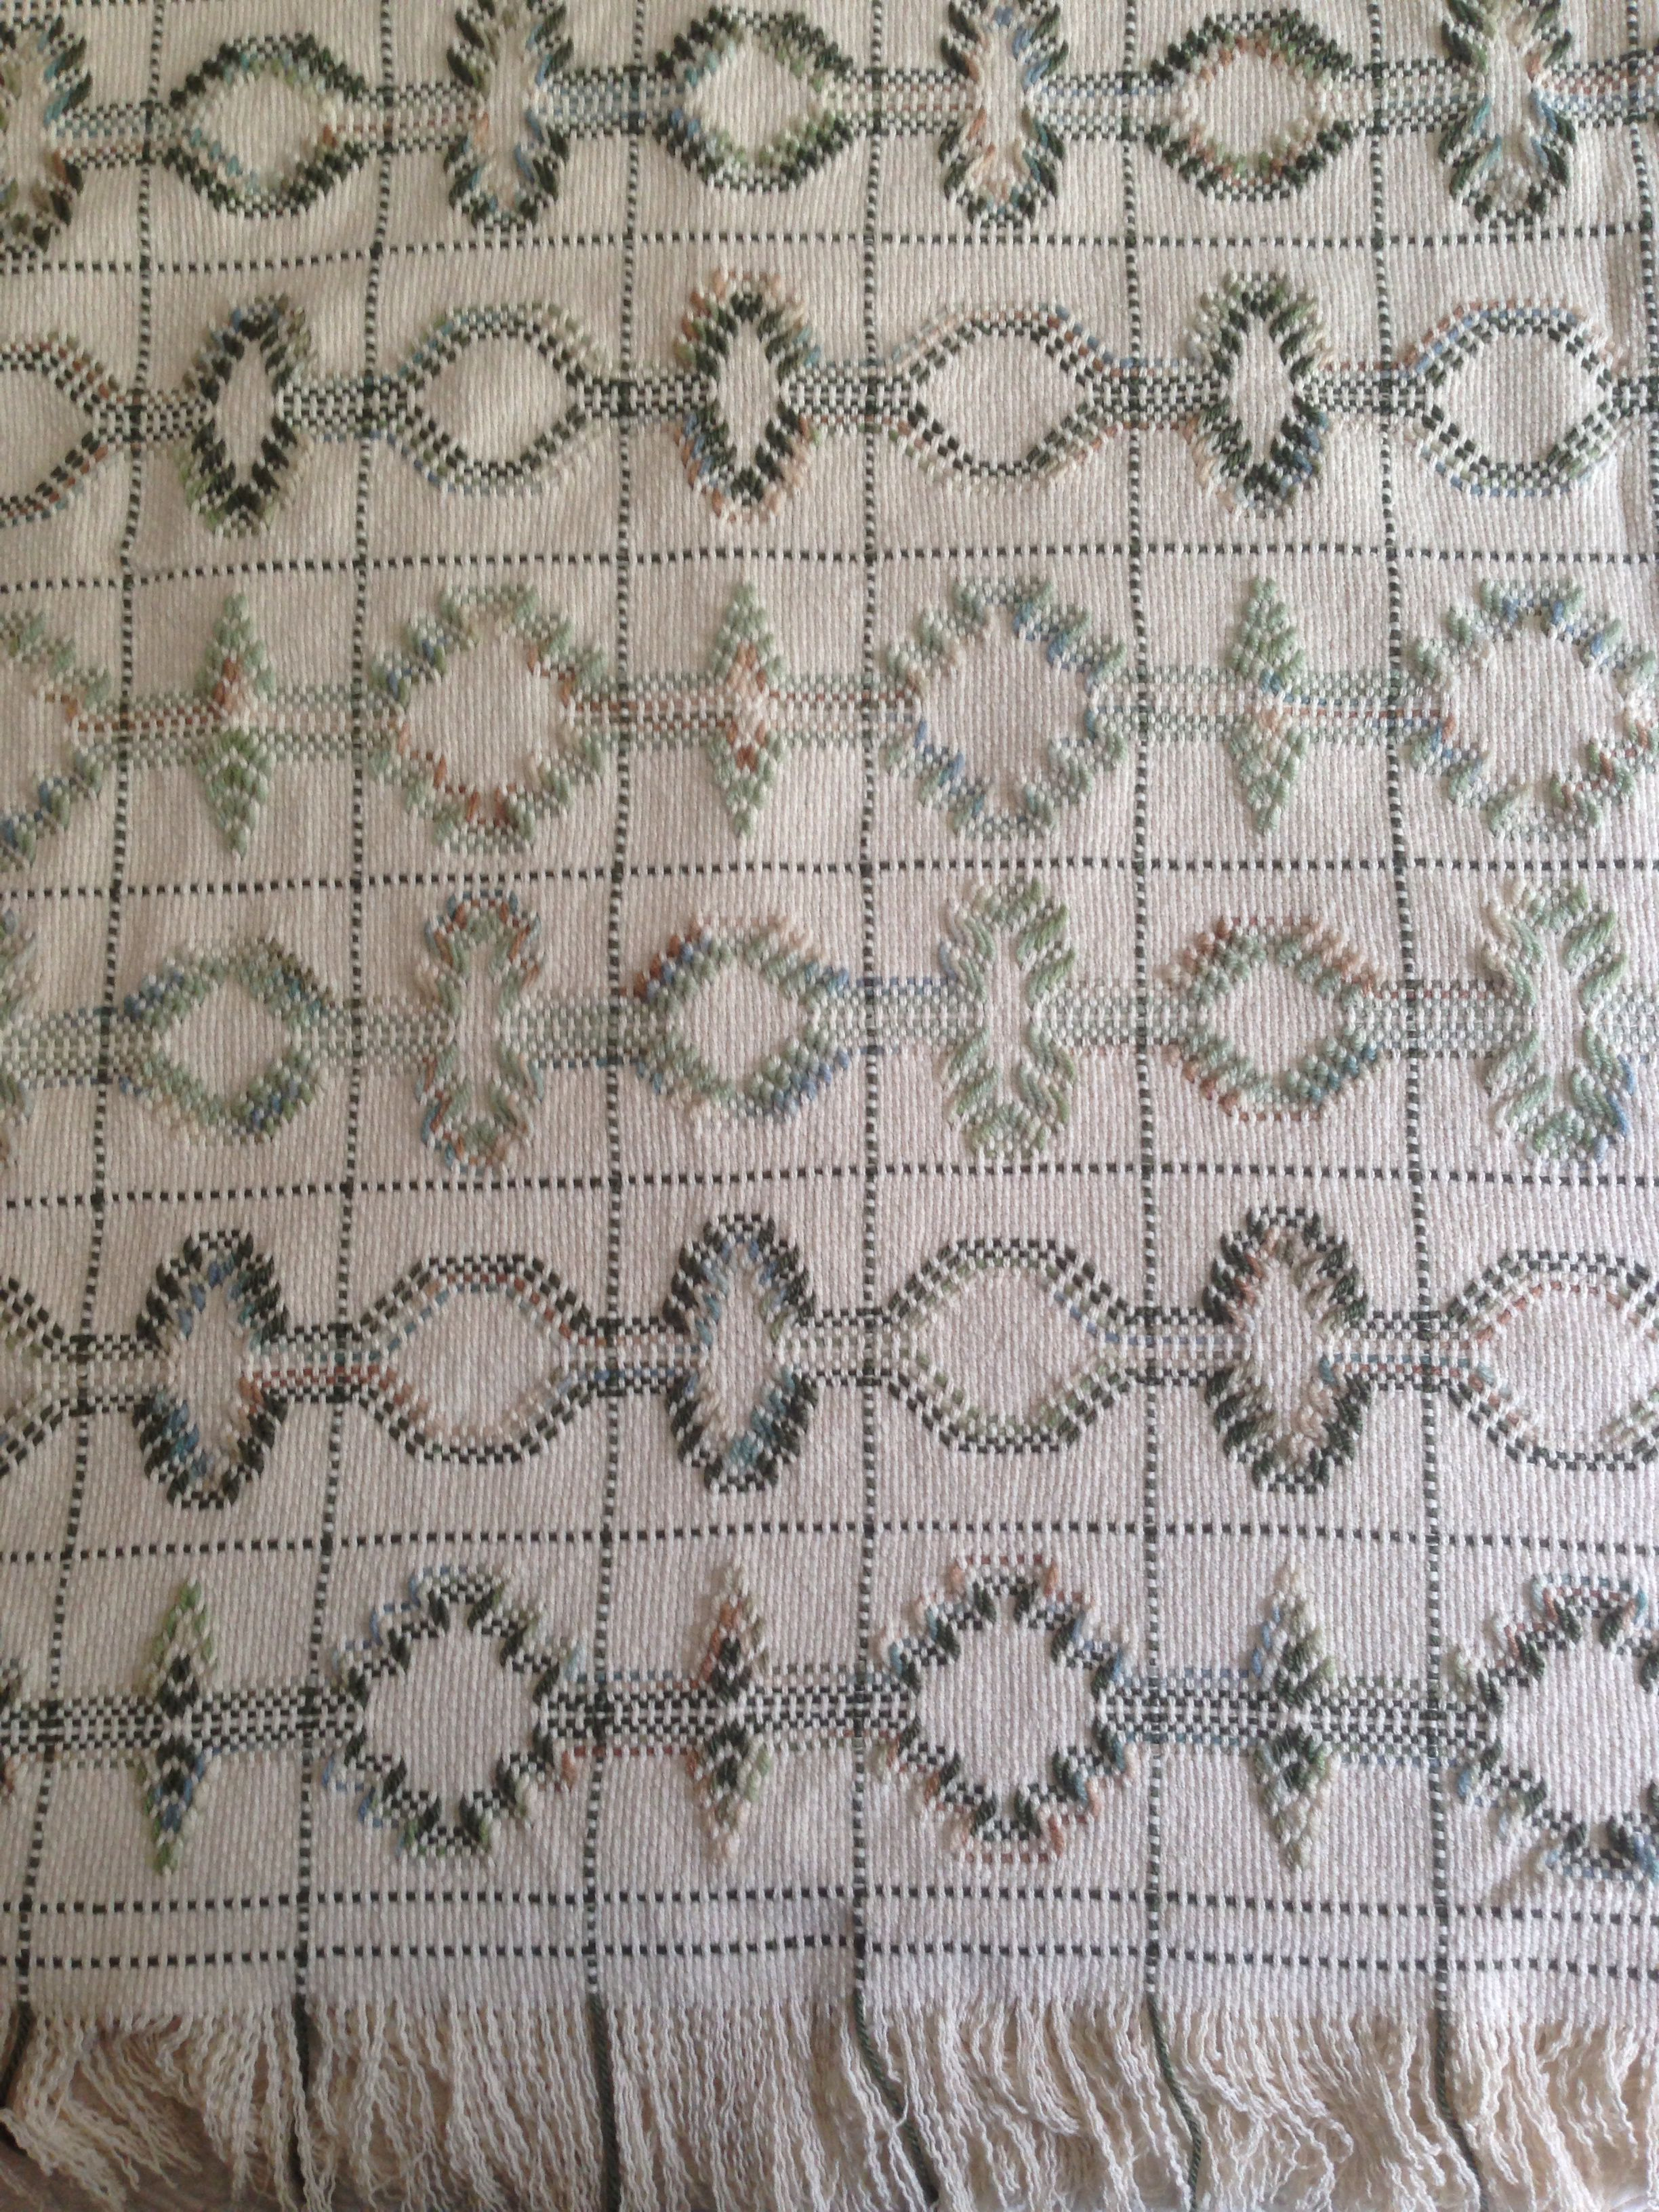 Swedish Embroidery, Monks Cloth, Swedish Weaving,